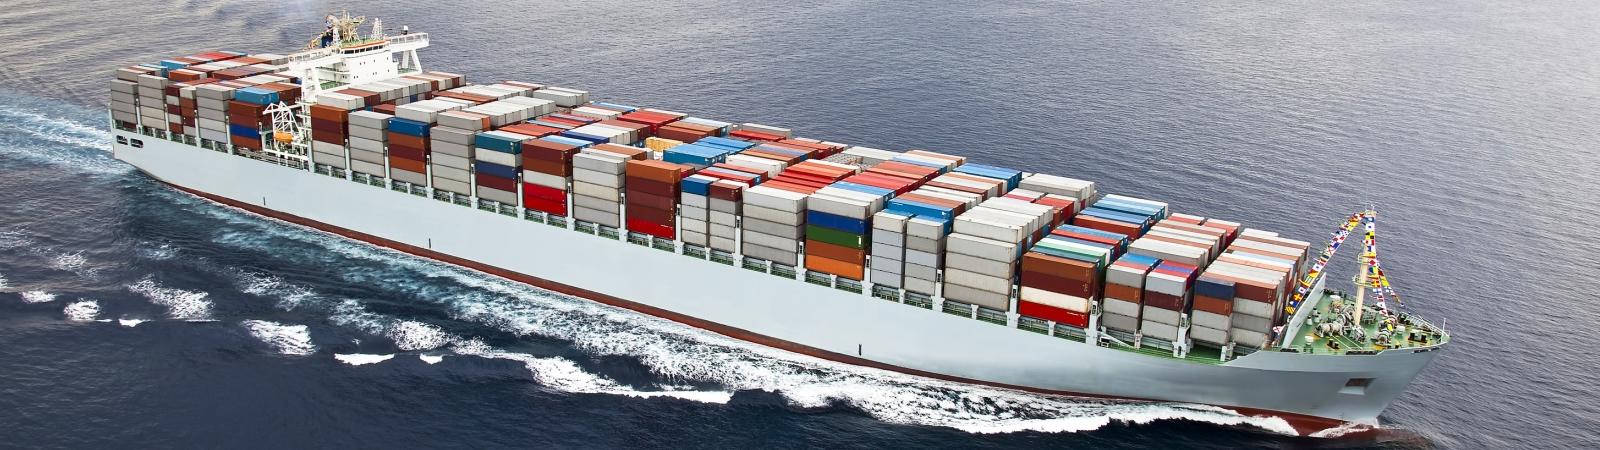 Trasporto navale